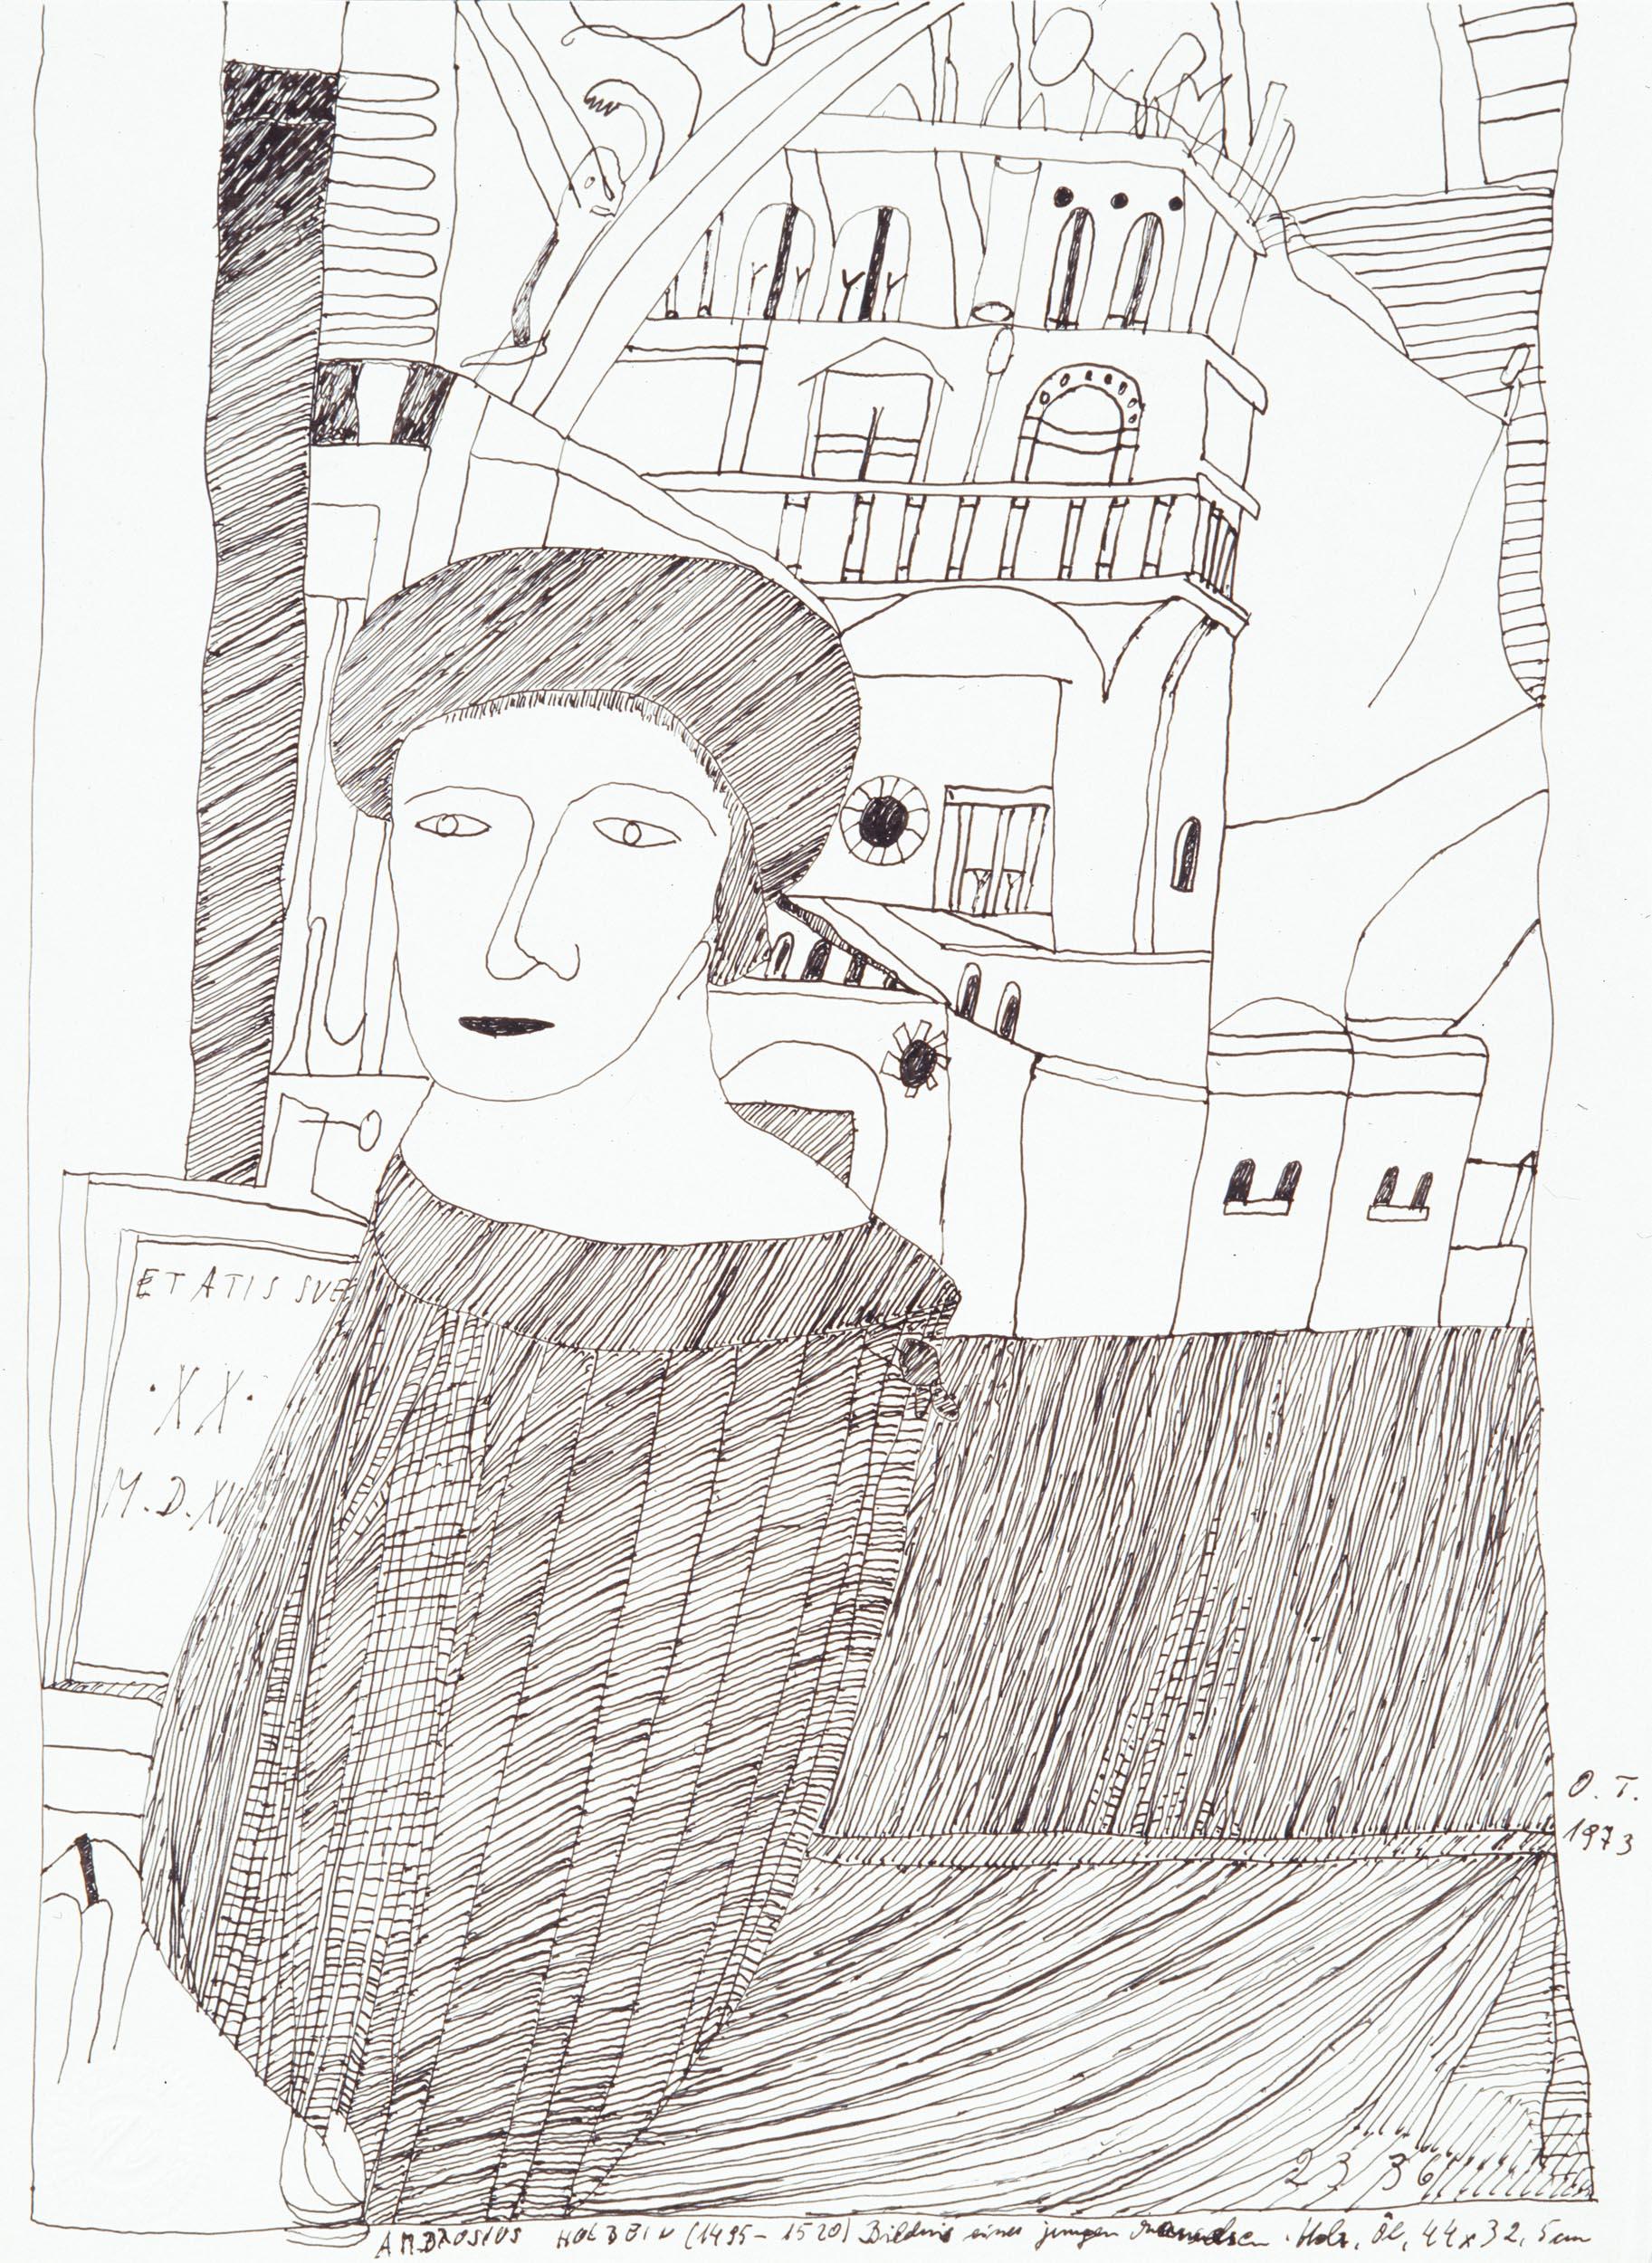 tschirtner oswald - Abzeichnung nach Holbein / Reproduction after Holbein